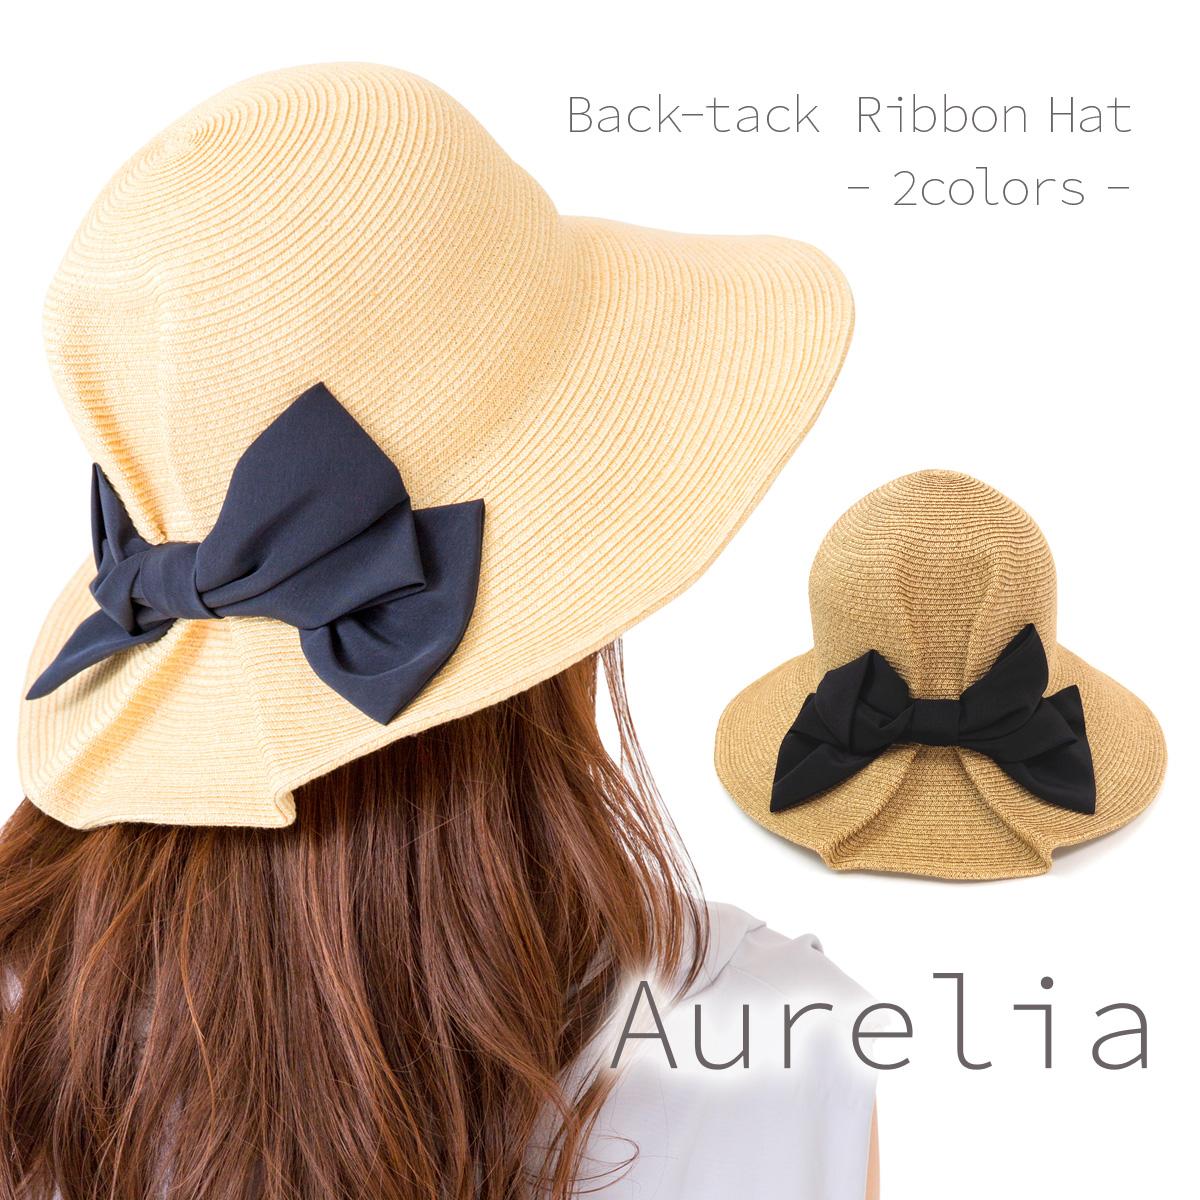 Aurelia バックタックリボンハット【日本製】【送料無料】 帽子 レディース